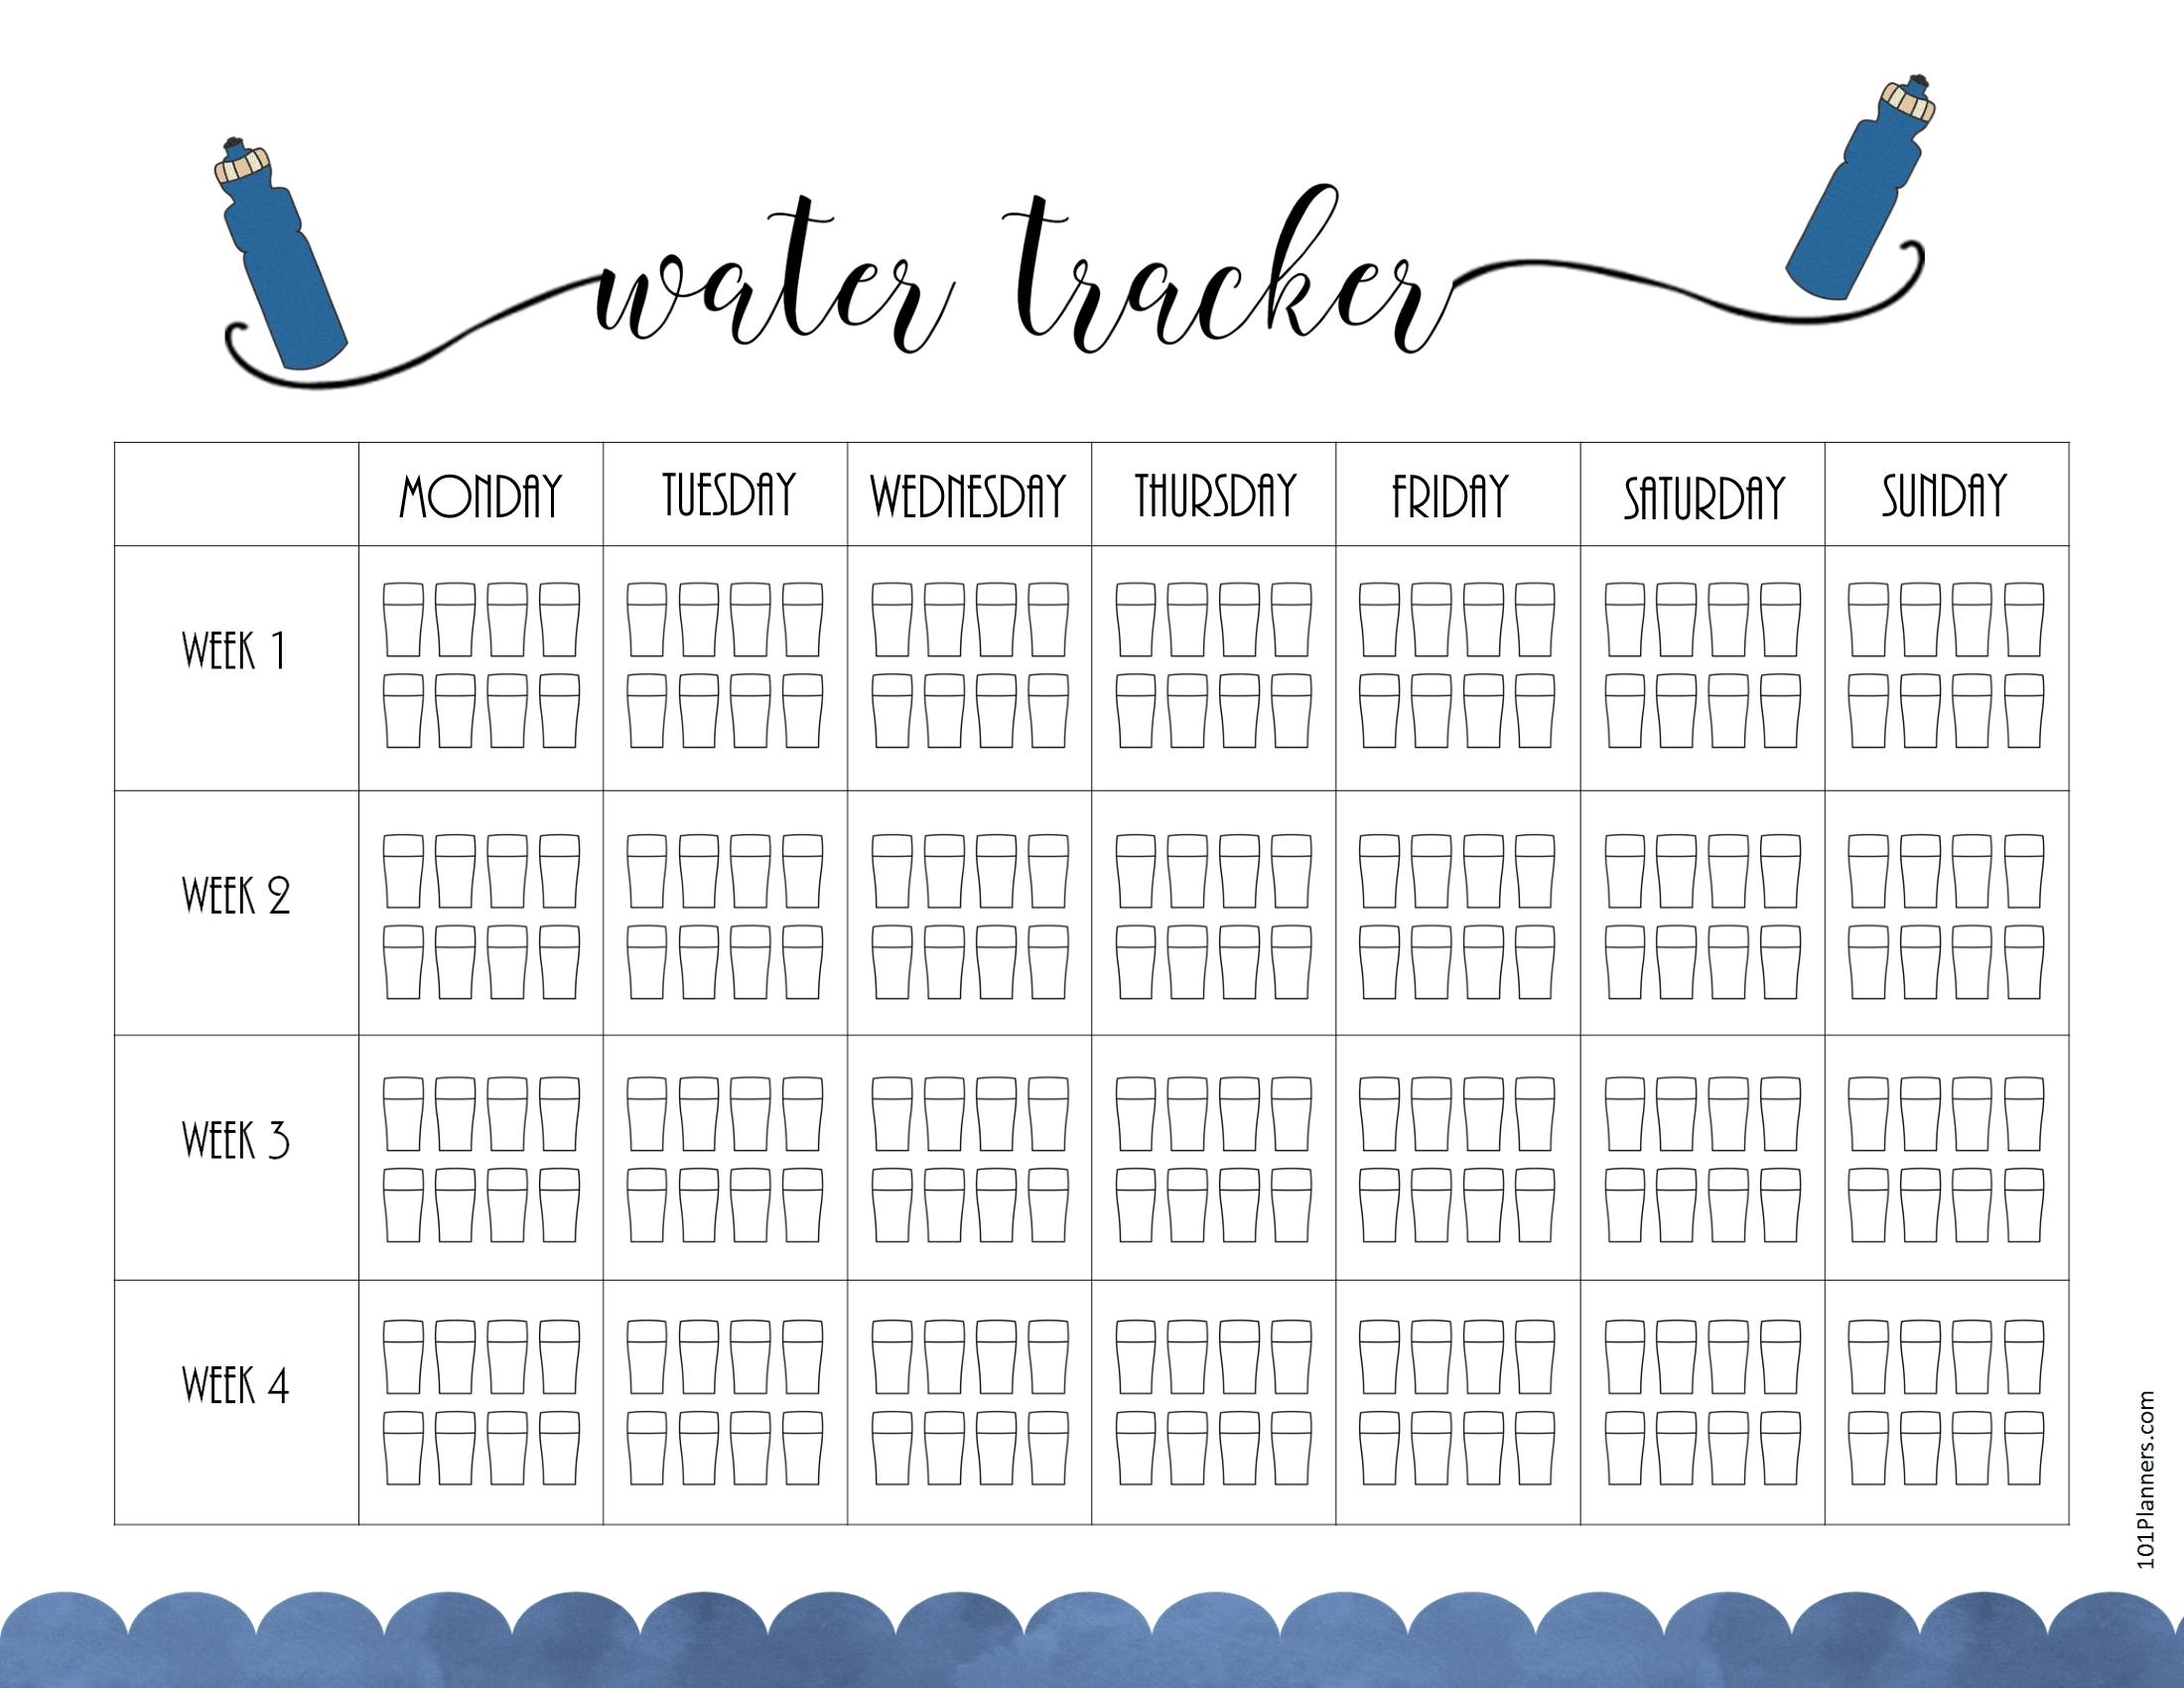 Free Printable Water Intake Chart throughout Printable Monday To Sunday Chart